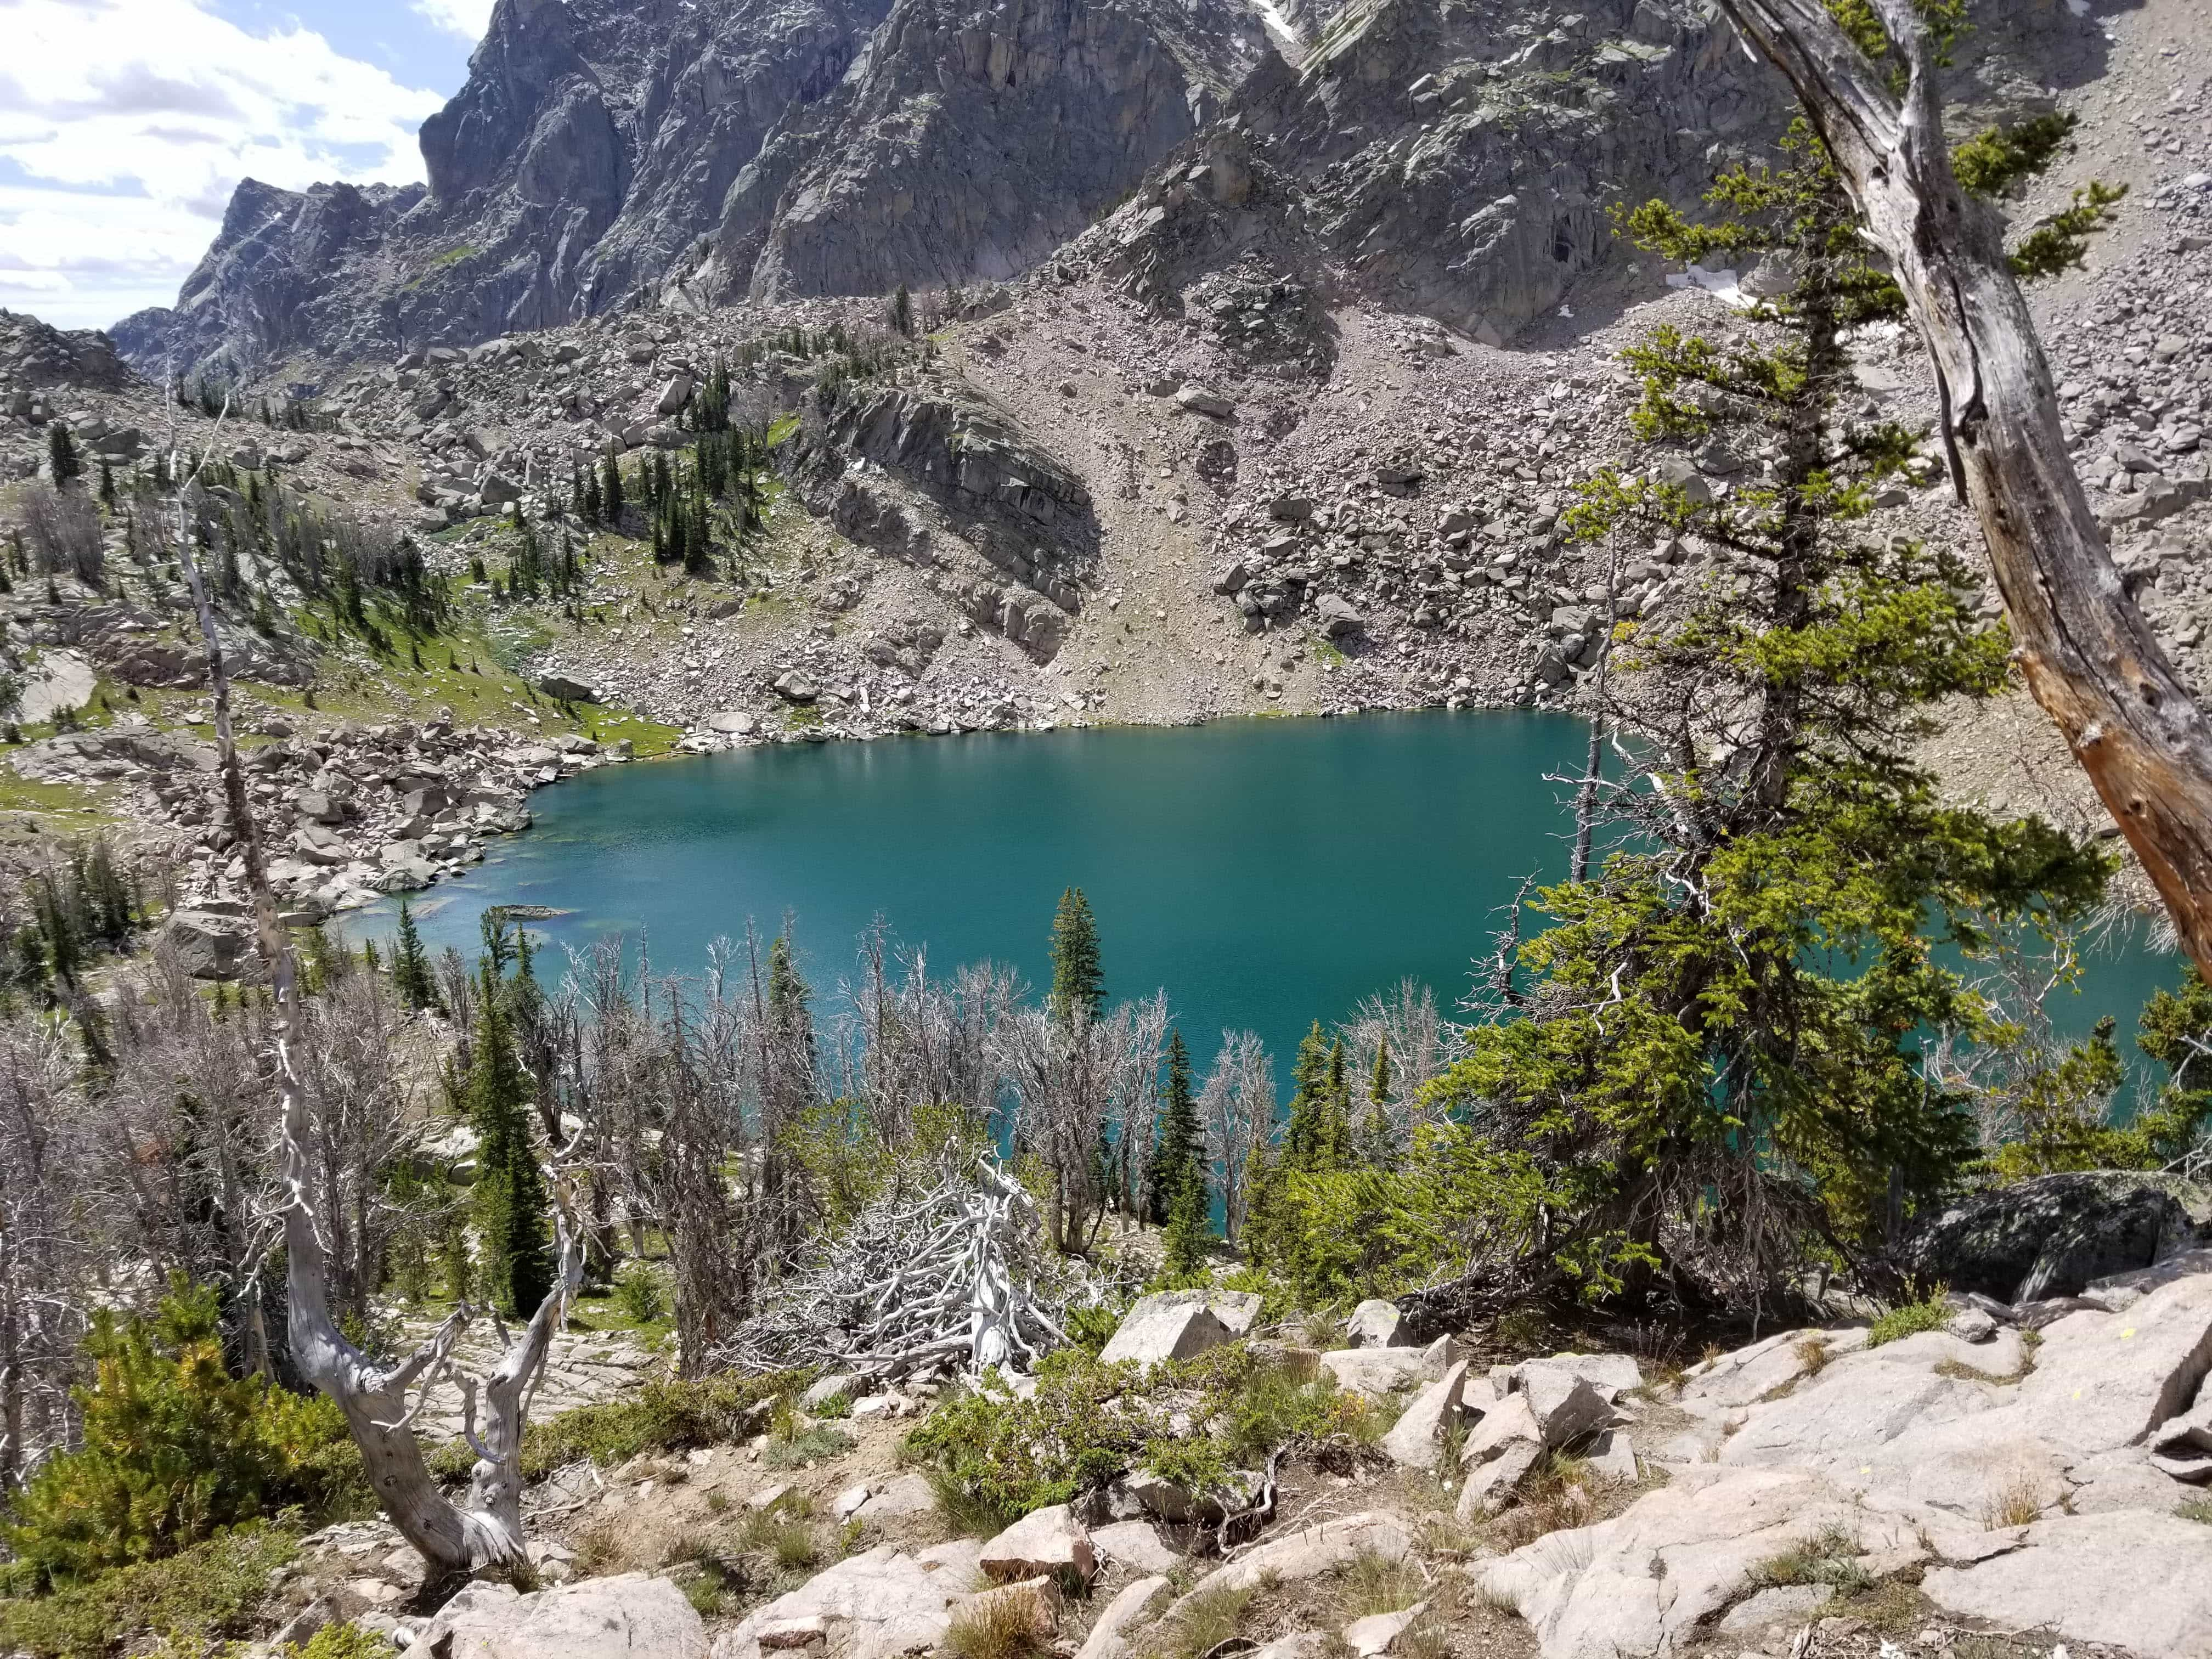 Lake Gadsby, Wyoming, Wind River Range